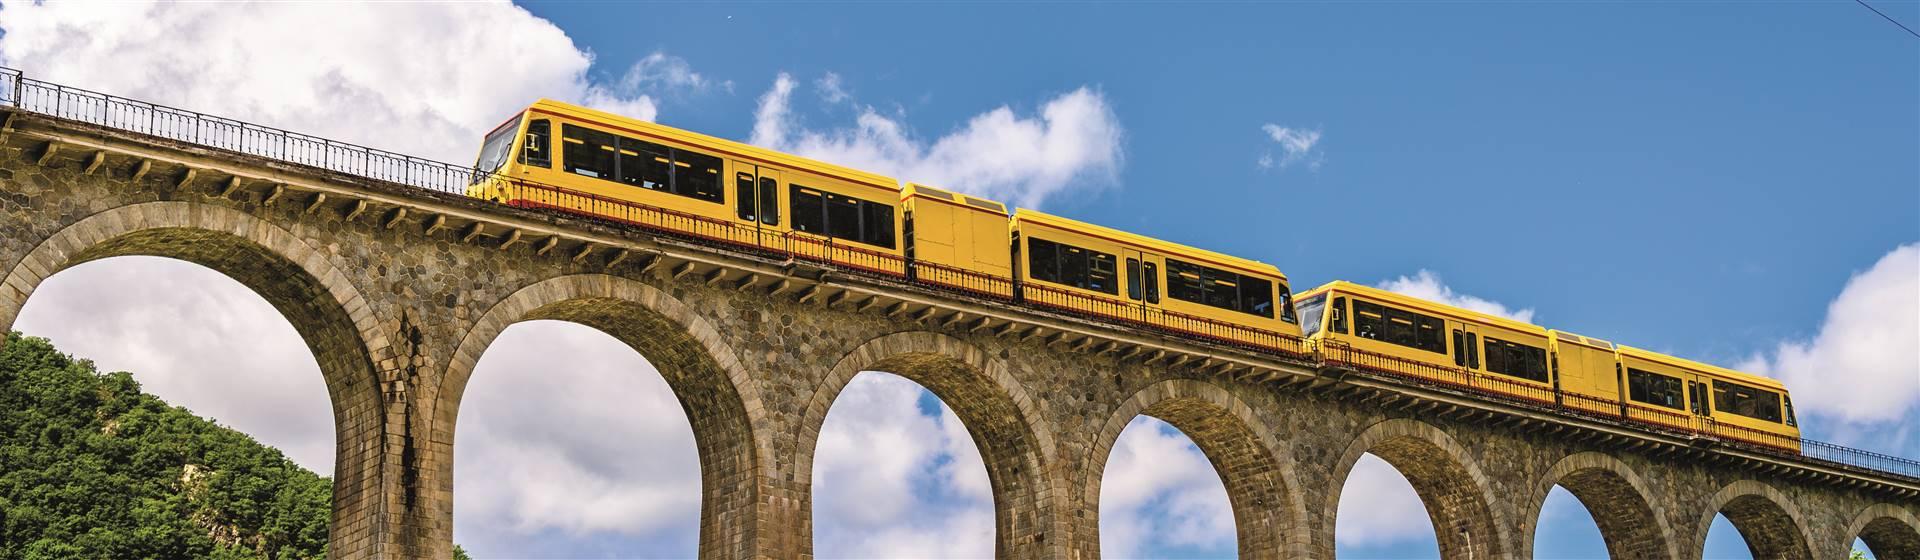 Costa Brava, Barcelona and the Little Yellow Train